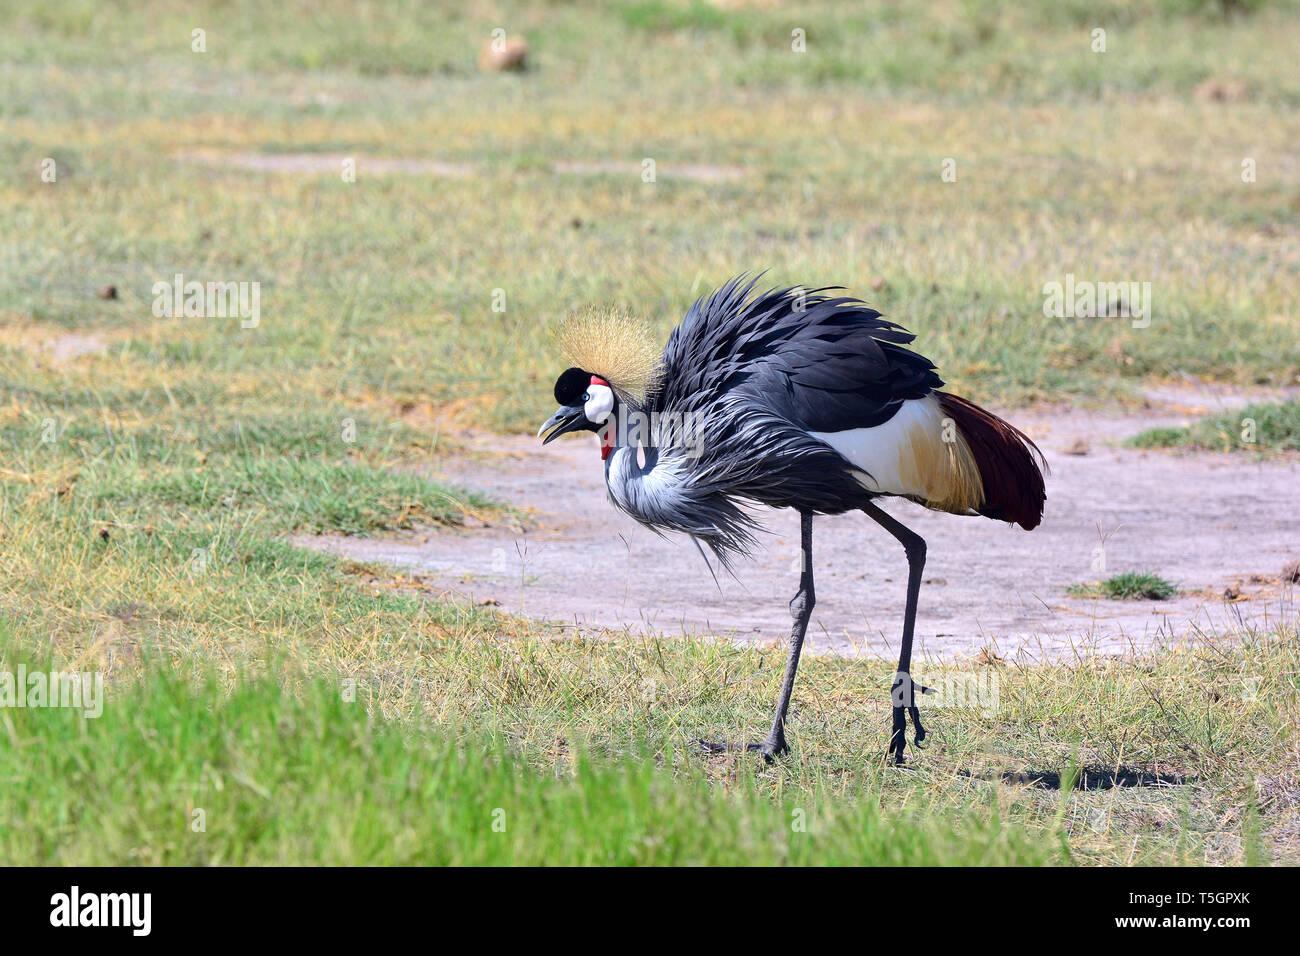 grey crowned crane, Südafrika-Kronenkranich, Grauhals-Kronenkranich, Balearica regulorum, szürkenyakú koronásdaru - Stock Image